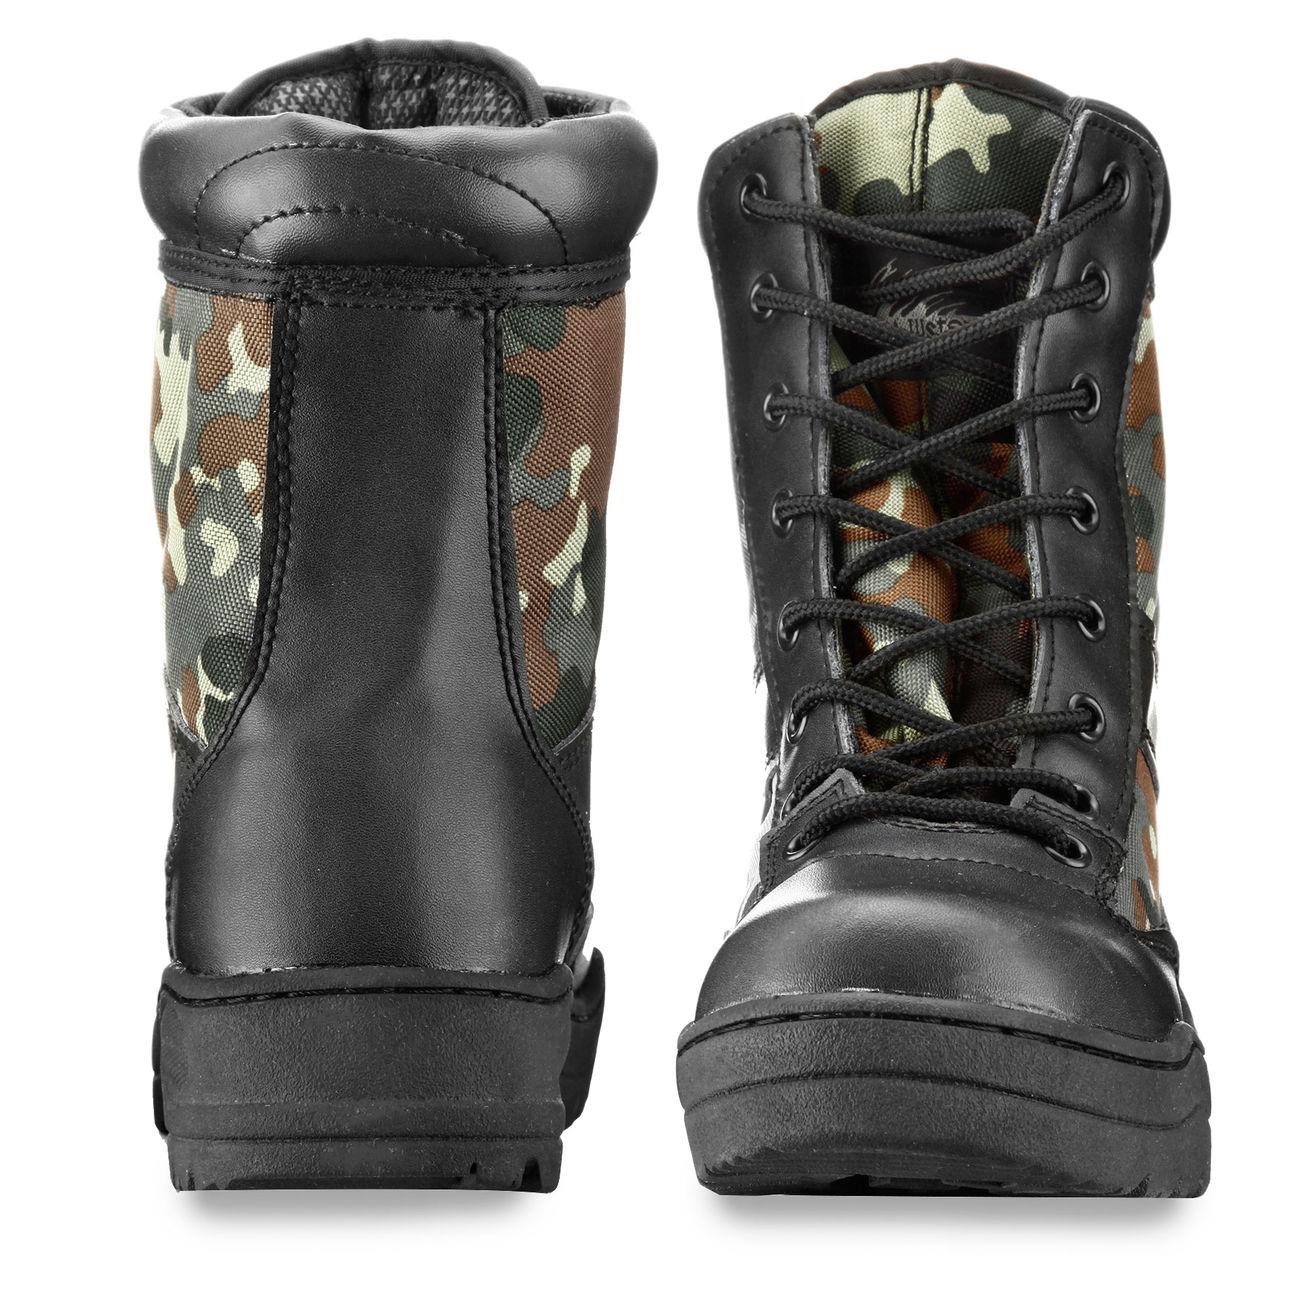 McAllister Outdoor Boots Stiefel flecktarn